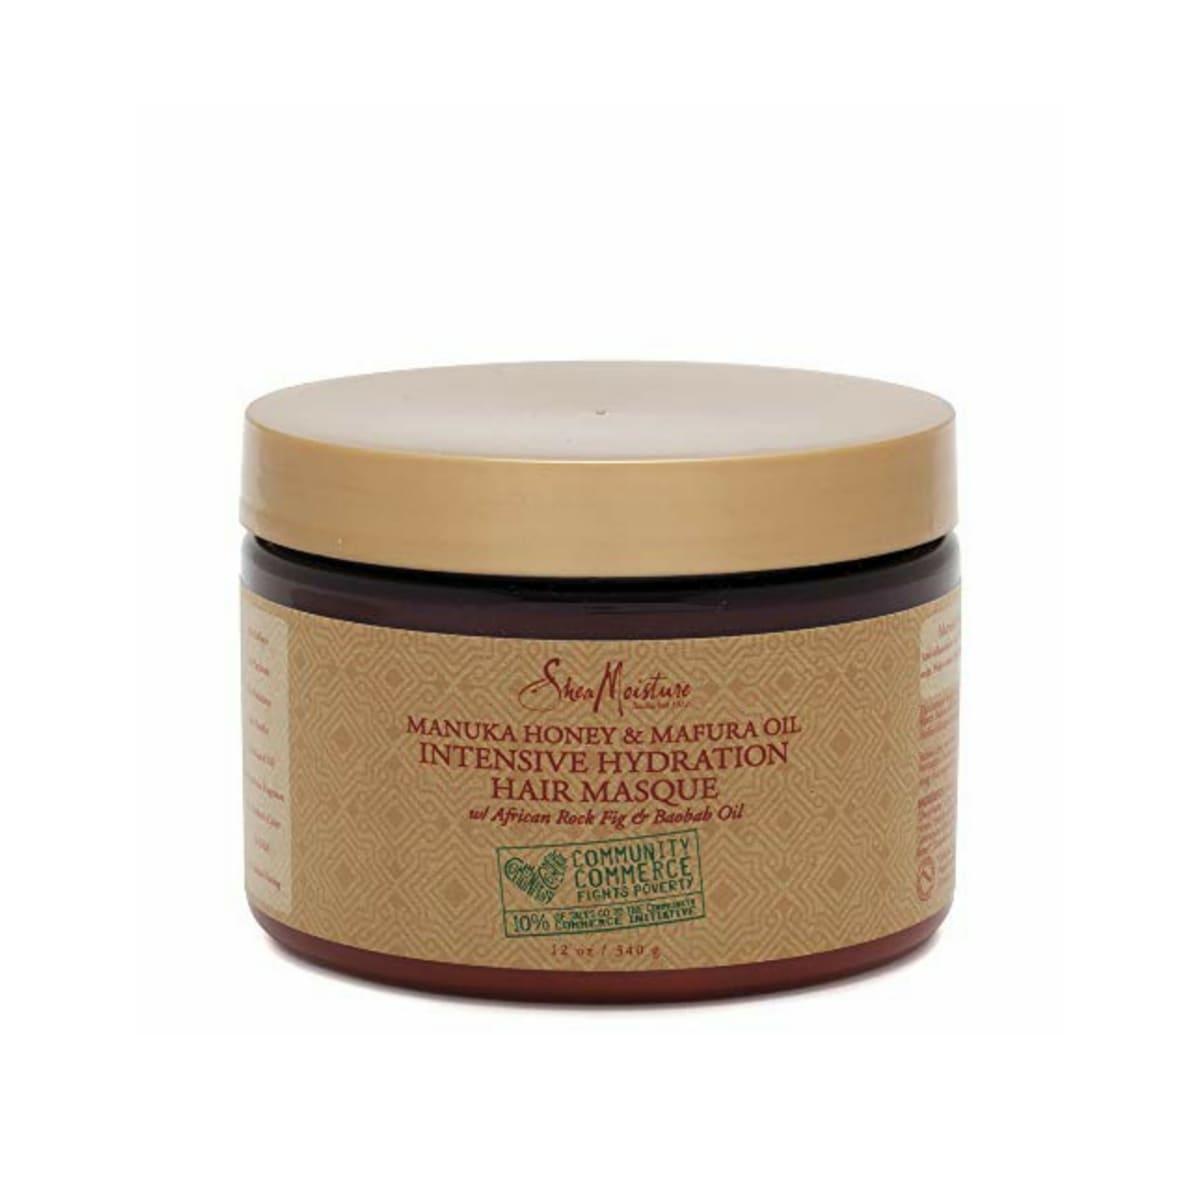 comprar-cosmetico-vegano-mascarilla-manuka-honey-&-mafura-oil-intensive-hydration-sheamoisture-metodo-curly-trenzas-crochet-pelucas-www.muerebella.com